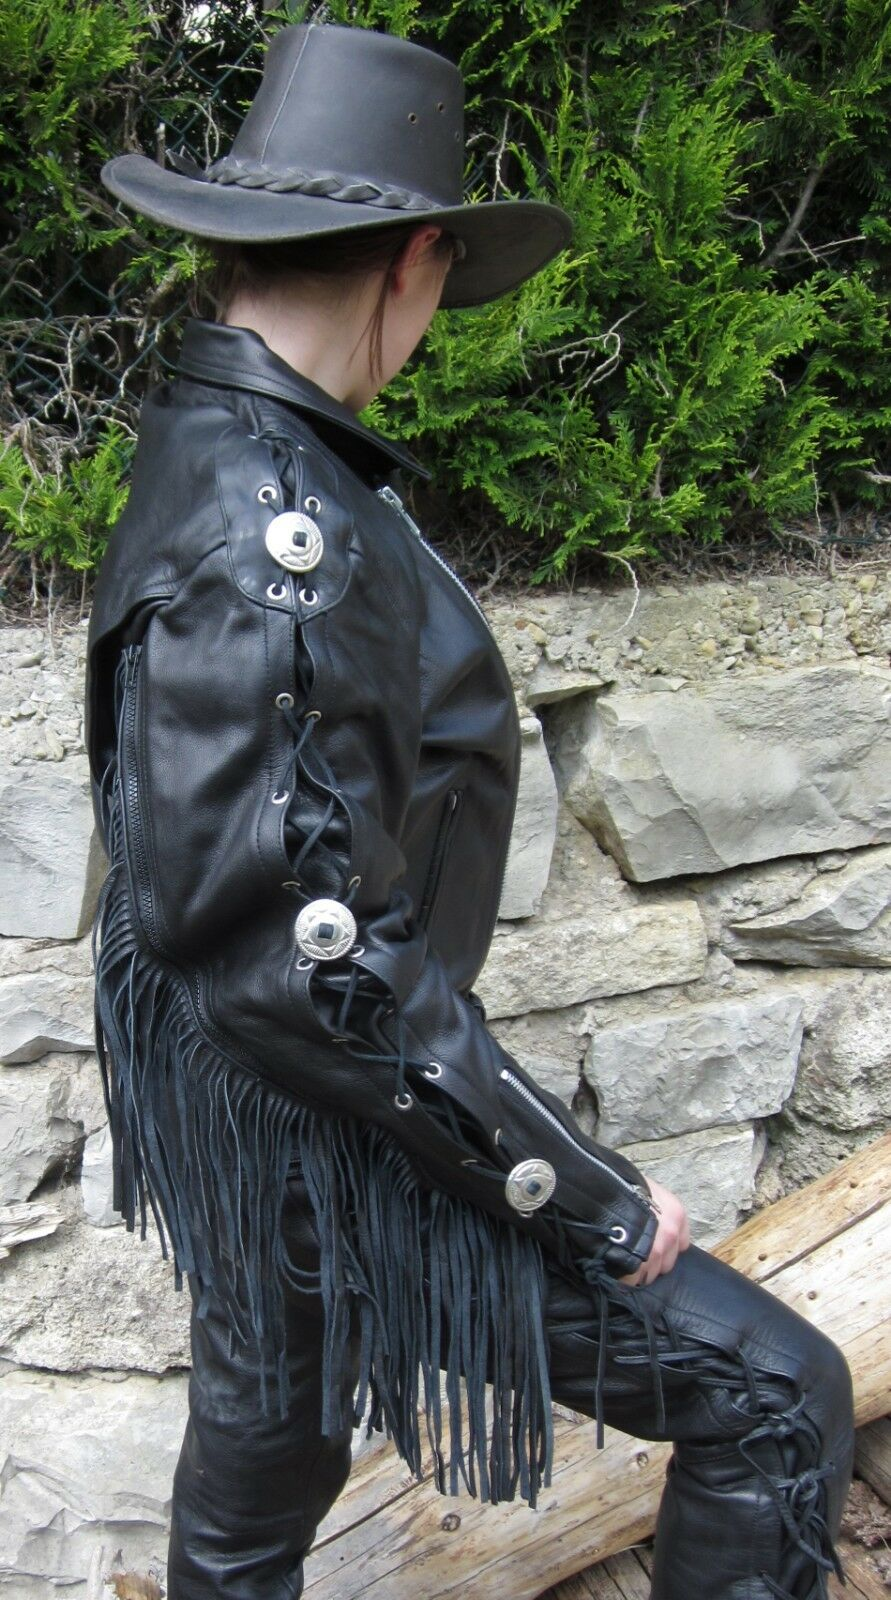 Easy Rider escorpión//Gensler talla 56 Chaqueta de cuero motocicleta chaqueta flecos chaqueta Highway